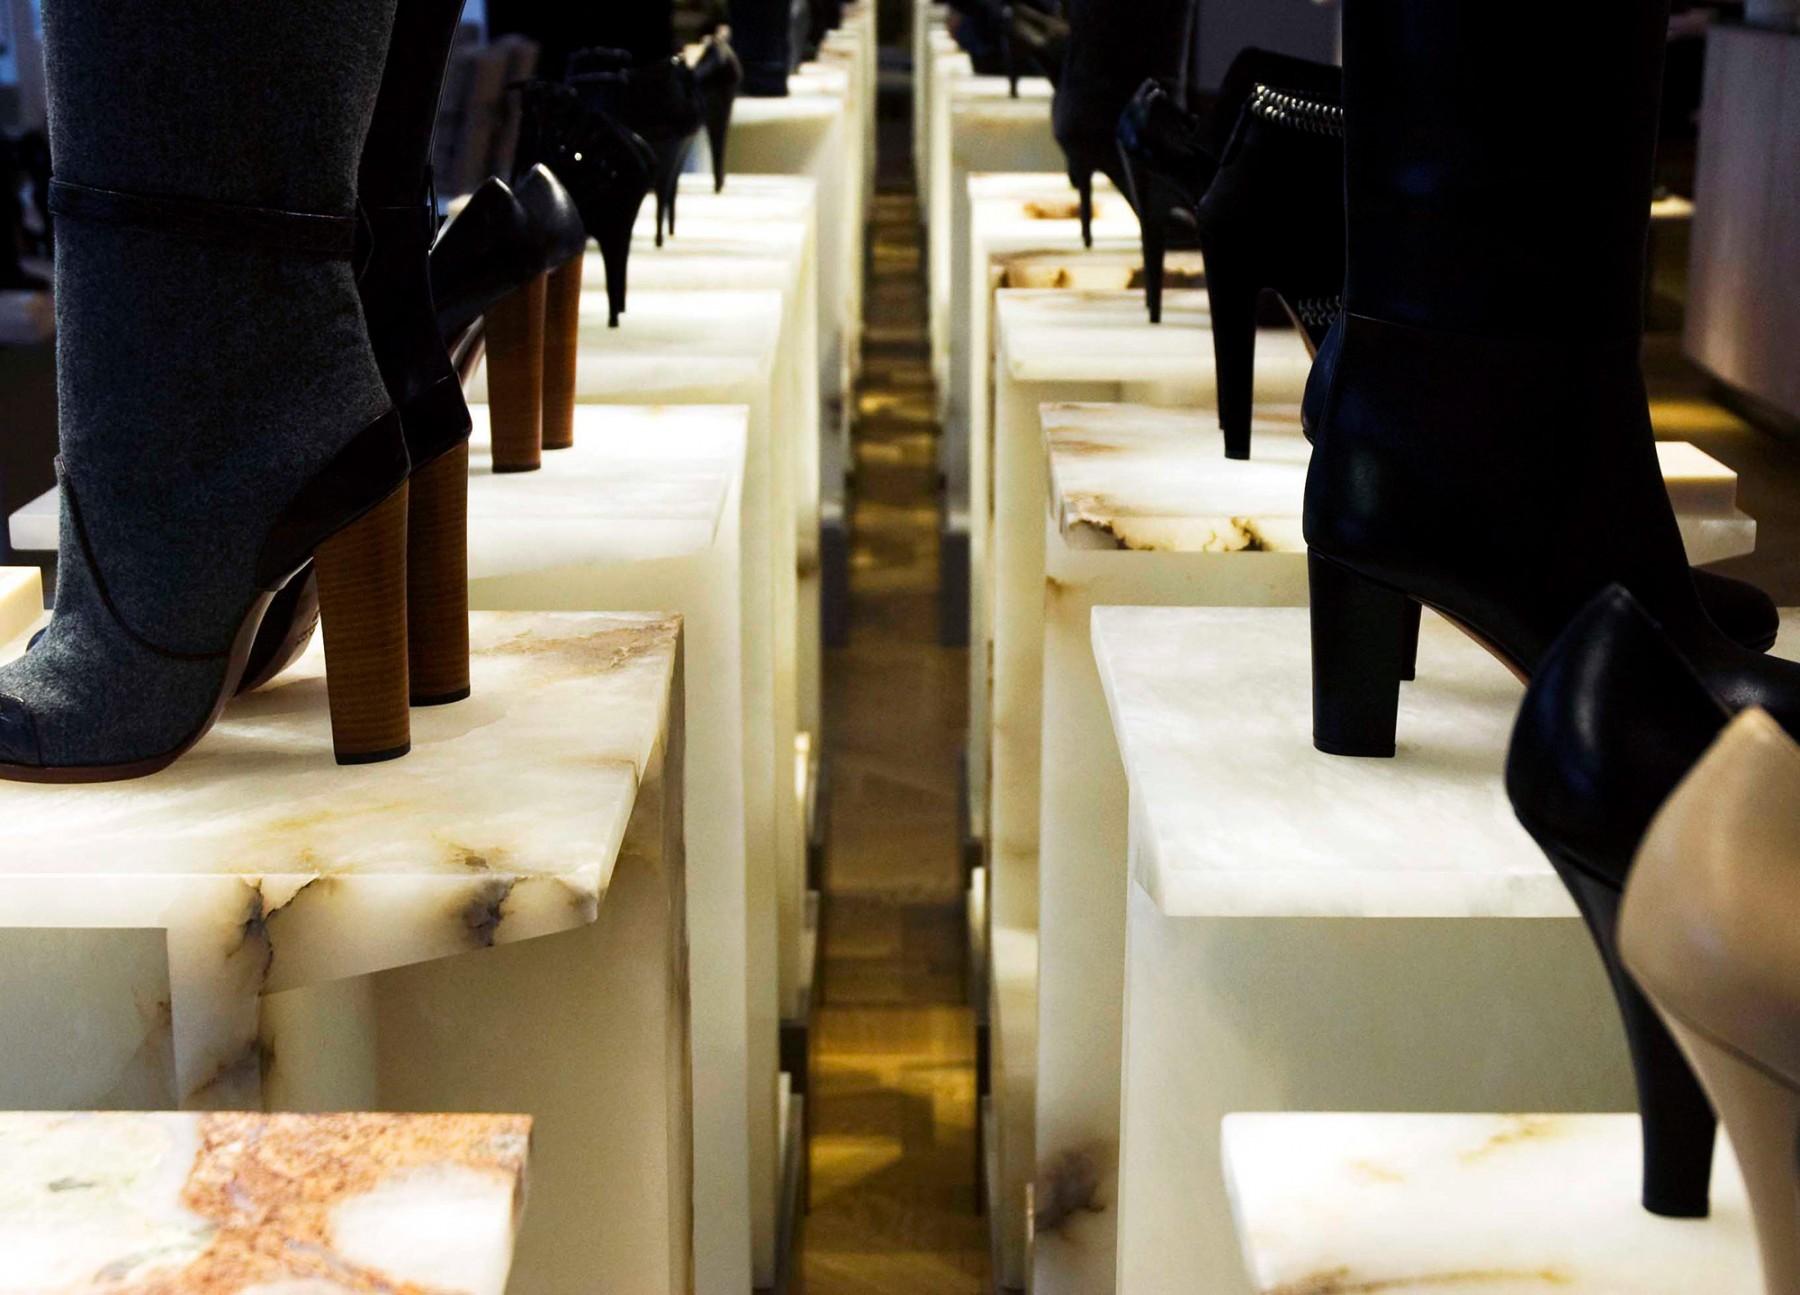 Selfridges-London-designer-fashion-retail-Jamie-Fobert-Architects-shoe-galleries-alabaster-plinths-4